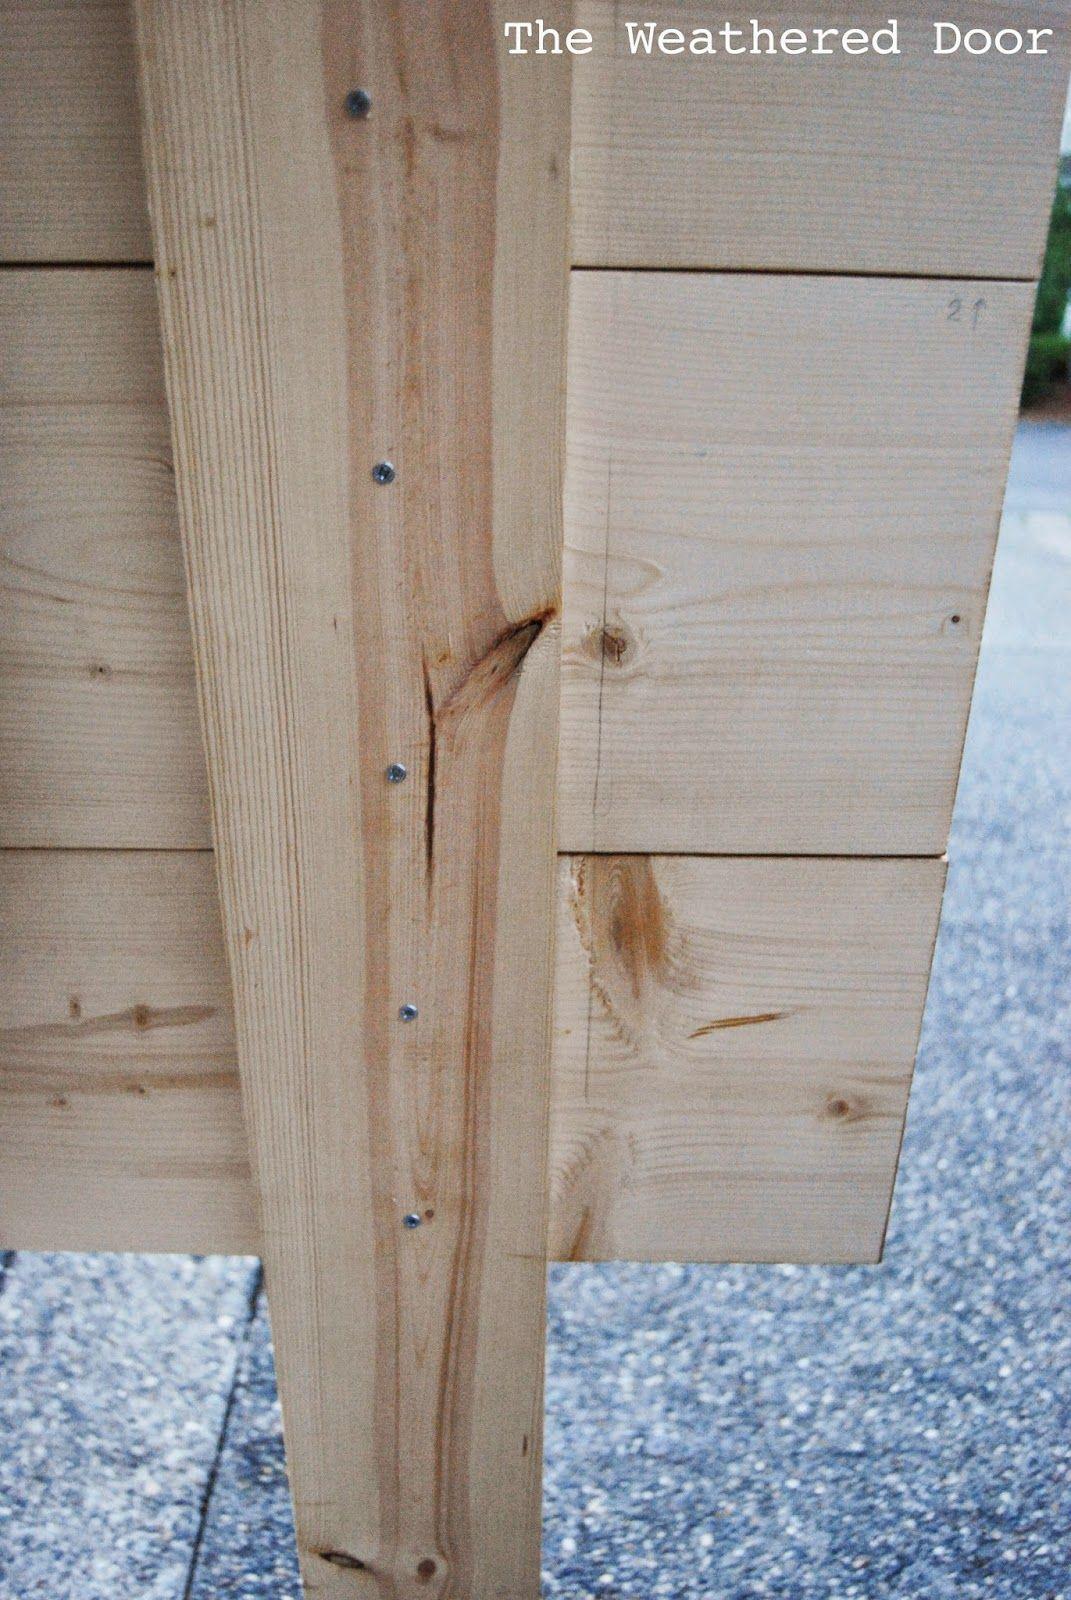 DIY Geometric Planked Wood Headboard Tutorial (for under $100) – The Weathered Door